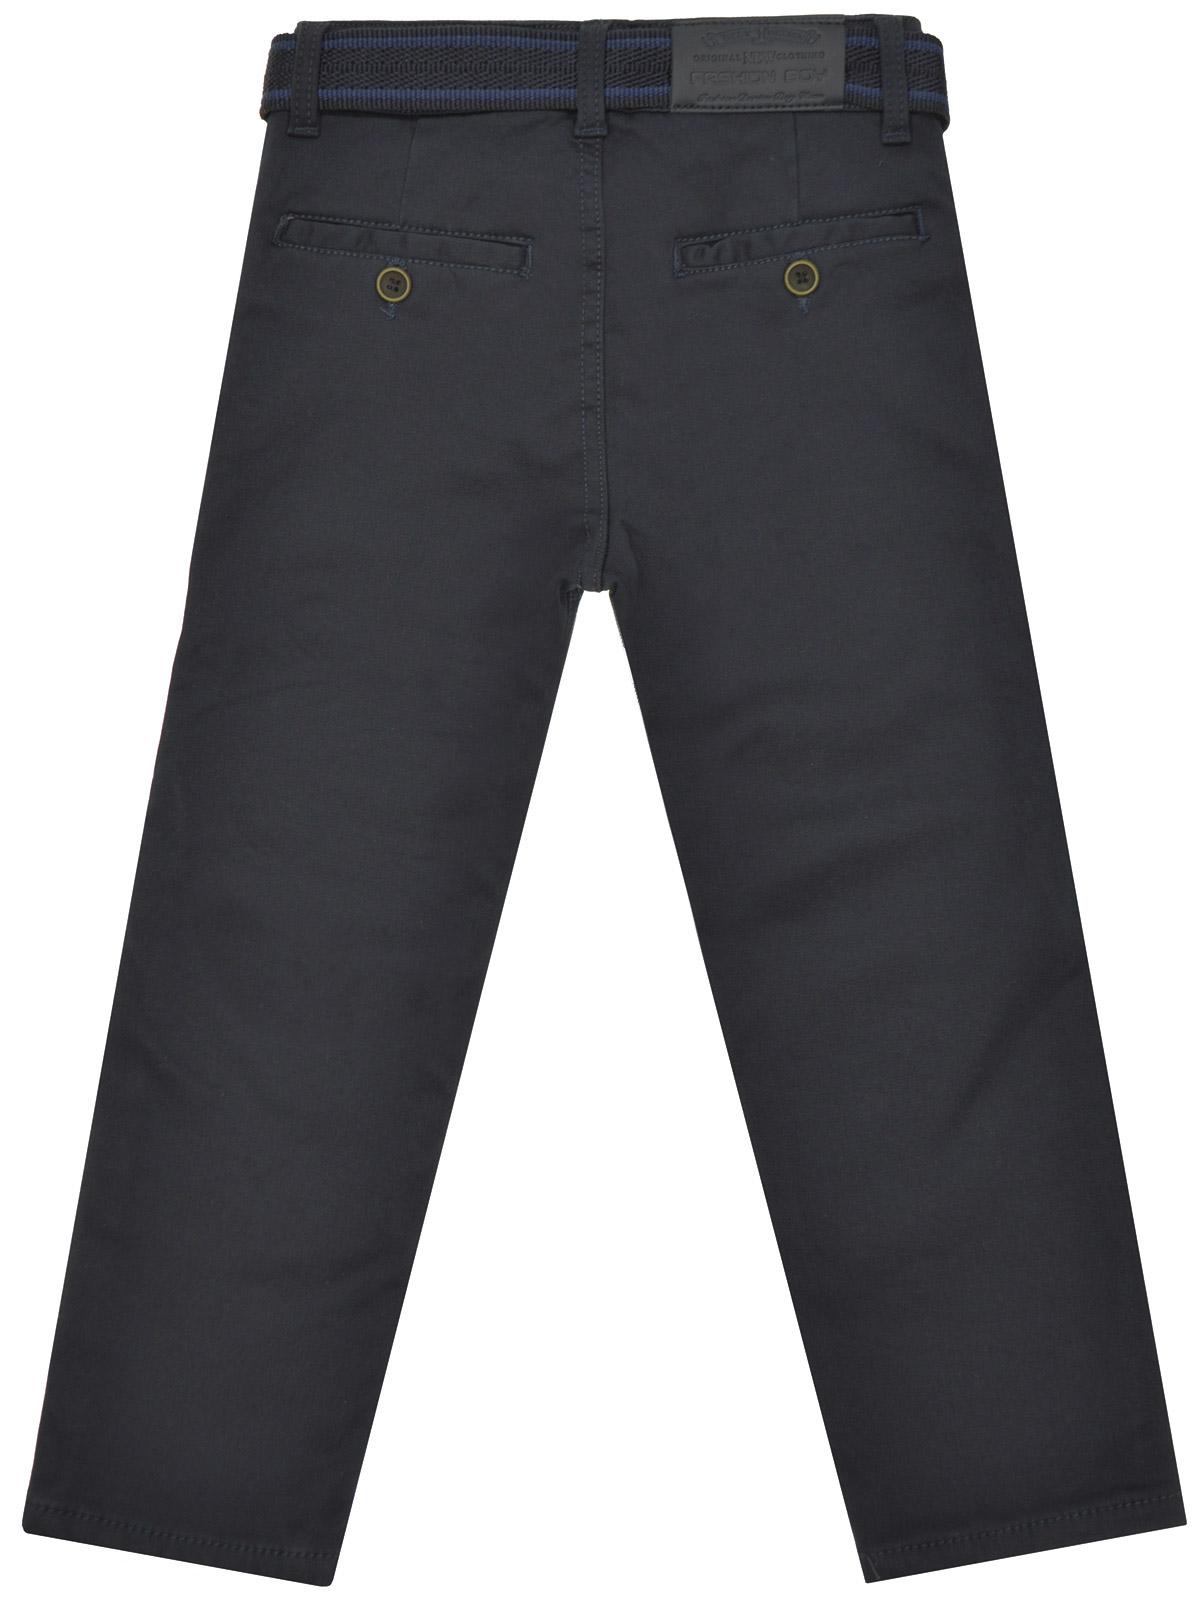 Enfants-Chino-THERMO-d-039-hiver-Pantalons-Garcons-Pantalon-Doublure-Stretch-Reglable-22904 miniature 13